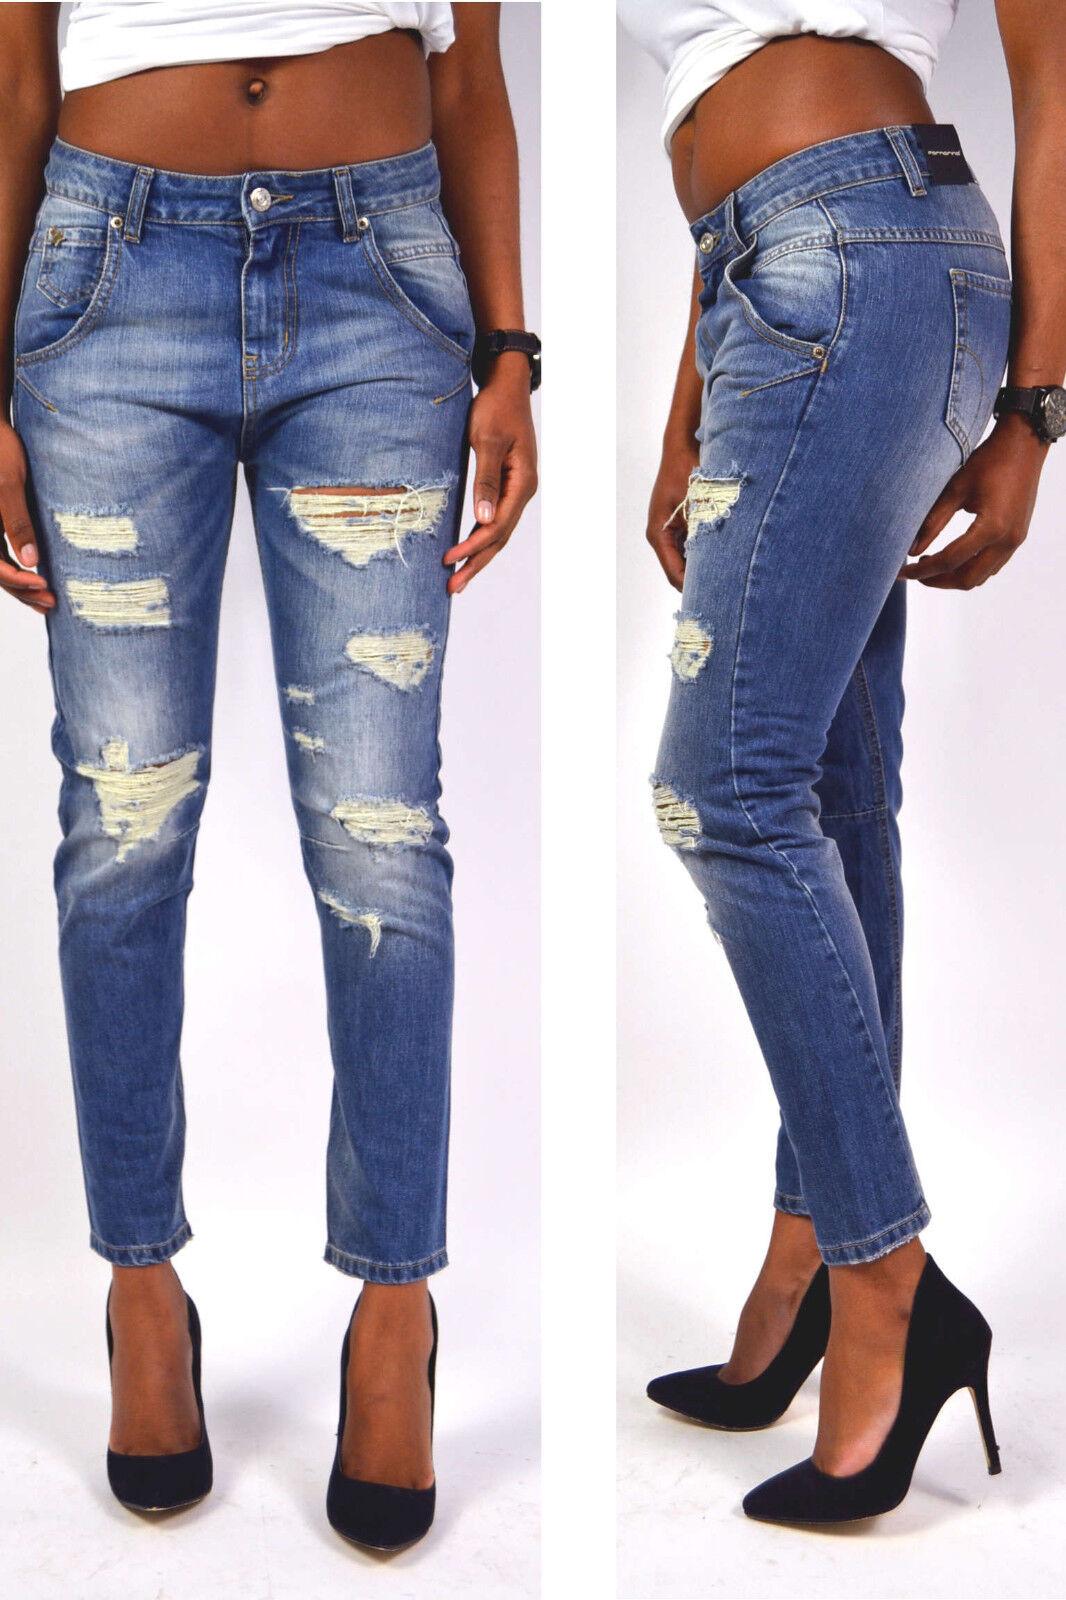 Fornarina Jeans MOON Boyfriend Jeansblue Ripped 100% Baumwolle NEU